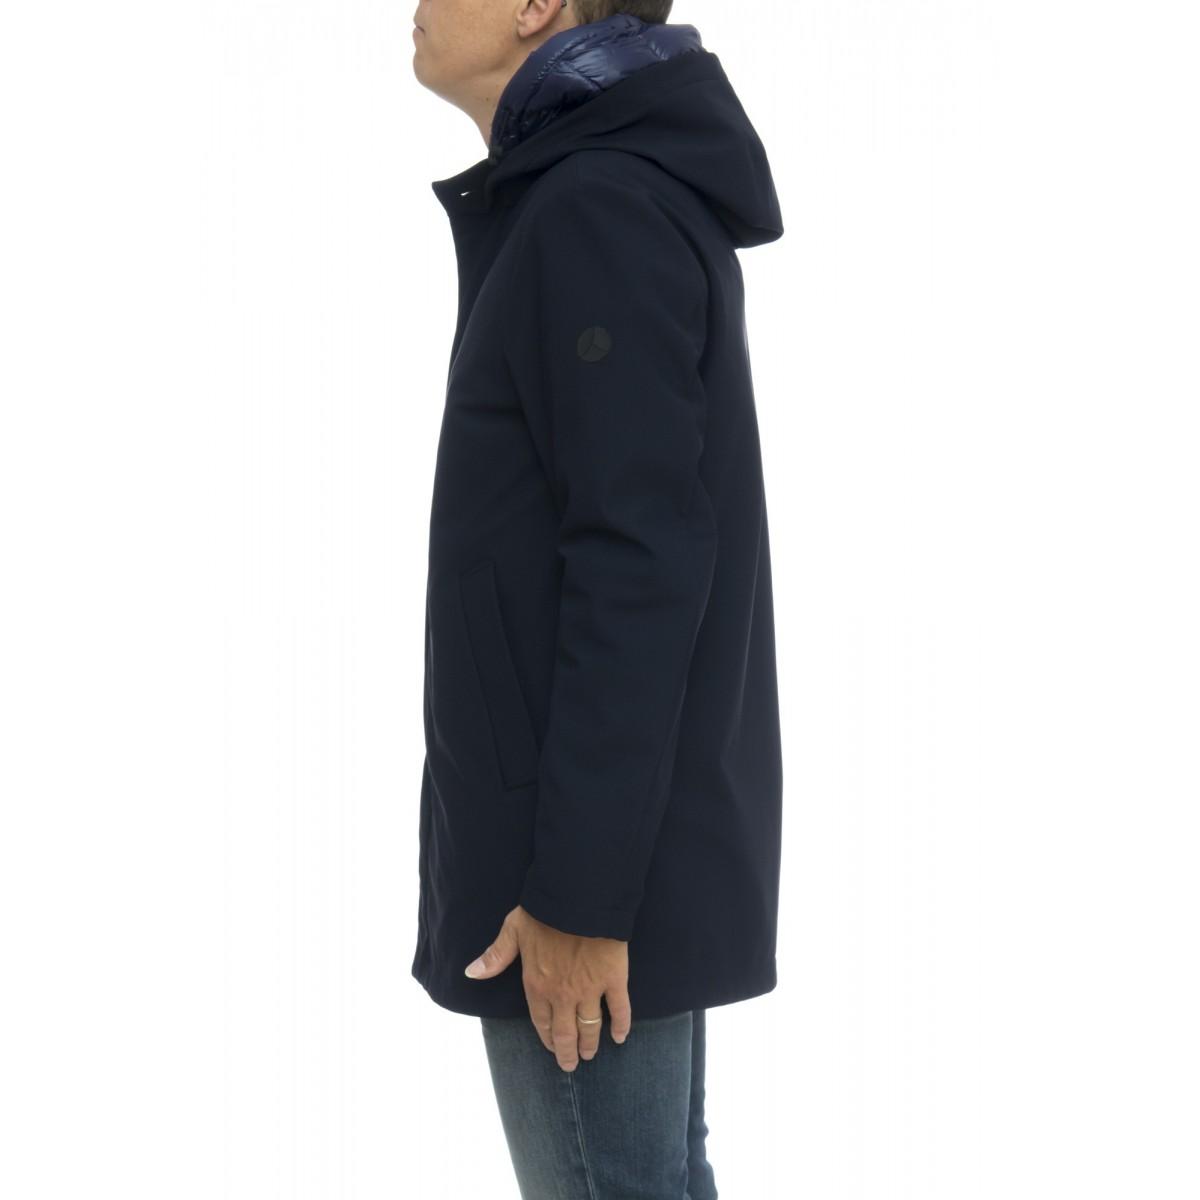 Down Jacket Man- Boku pm888 trence soft shell